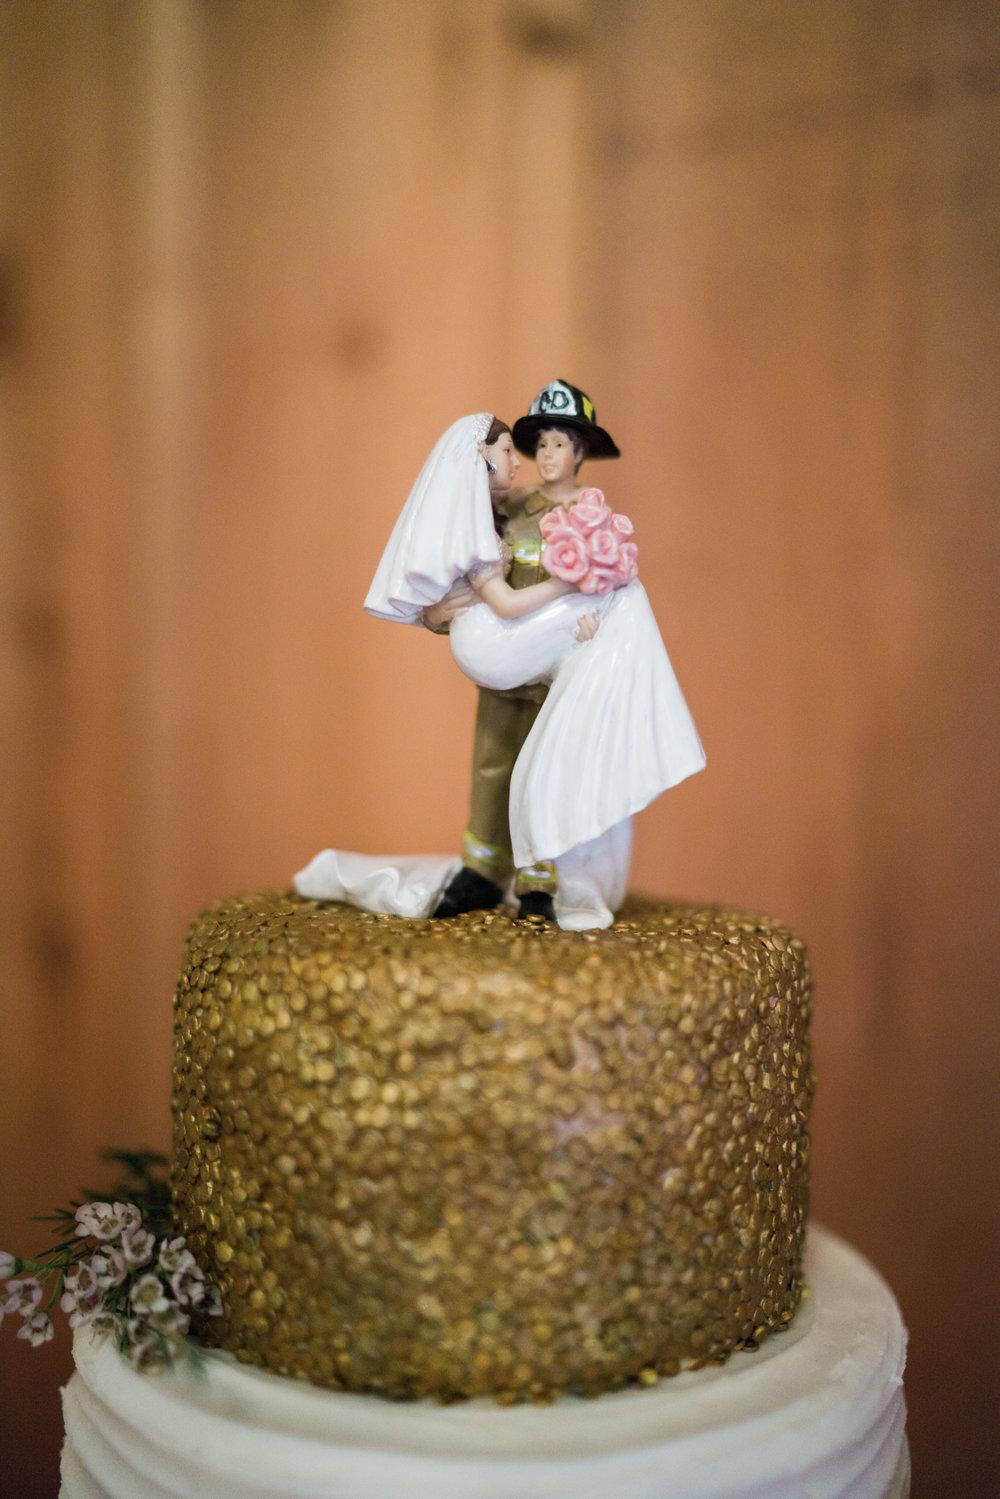 cake topper - fireman bride